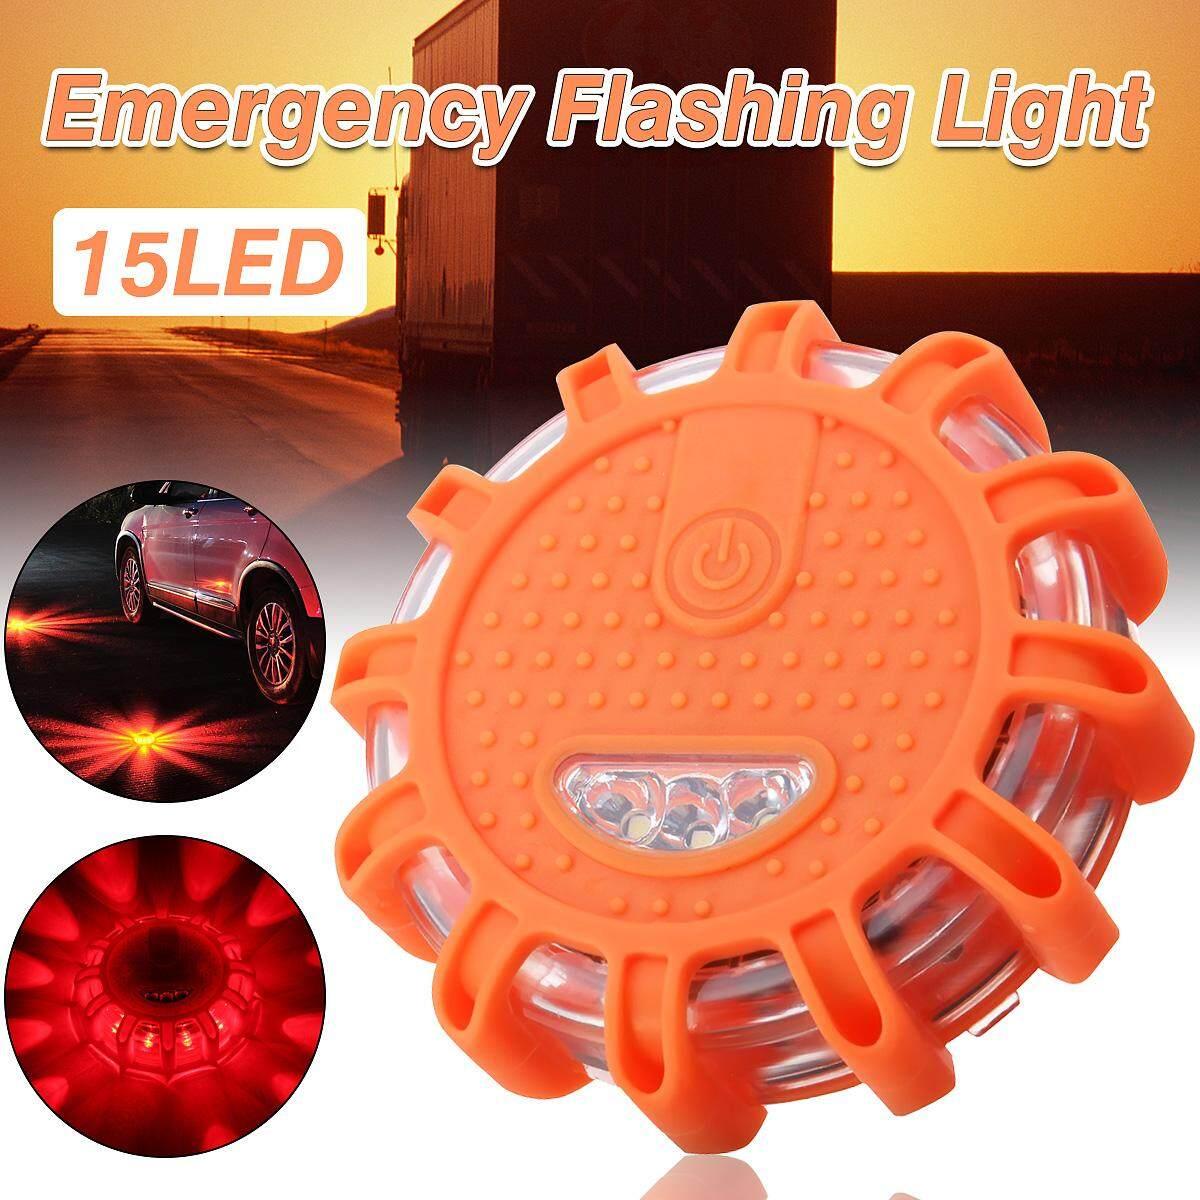 Otomatis 15 LED Sepanjang Beacon Darurat Strobe Berkedip Lampu Peringatan Keselamatan Mobil Oranye-Internasional